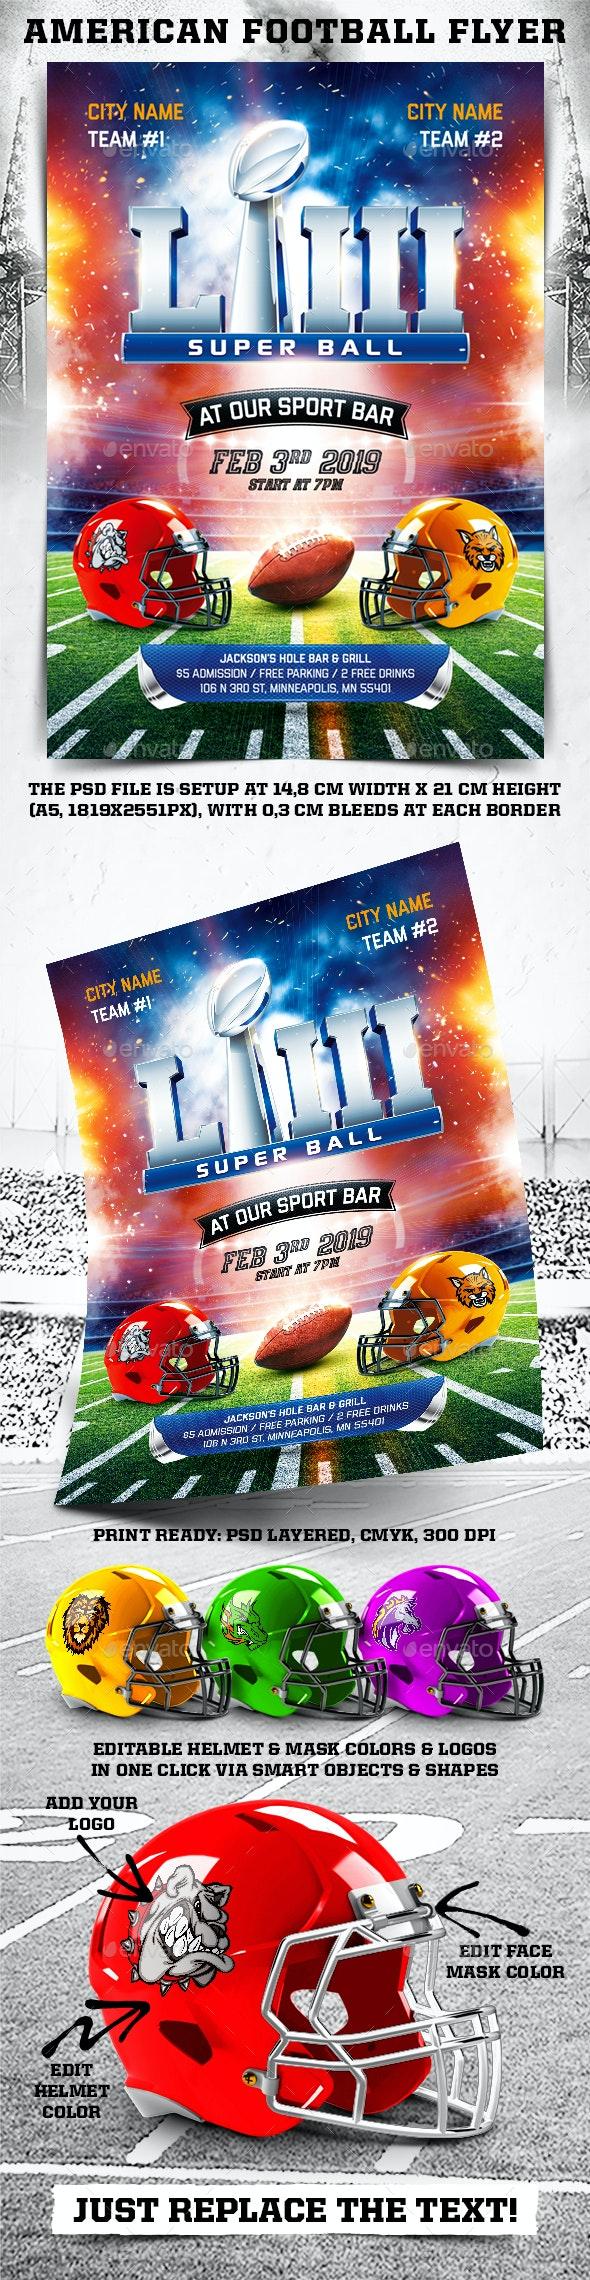 American Football Super Ball Flyer vol.9 - Sports Events